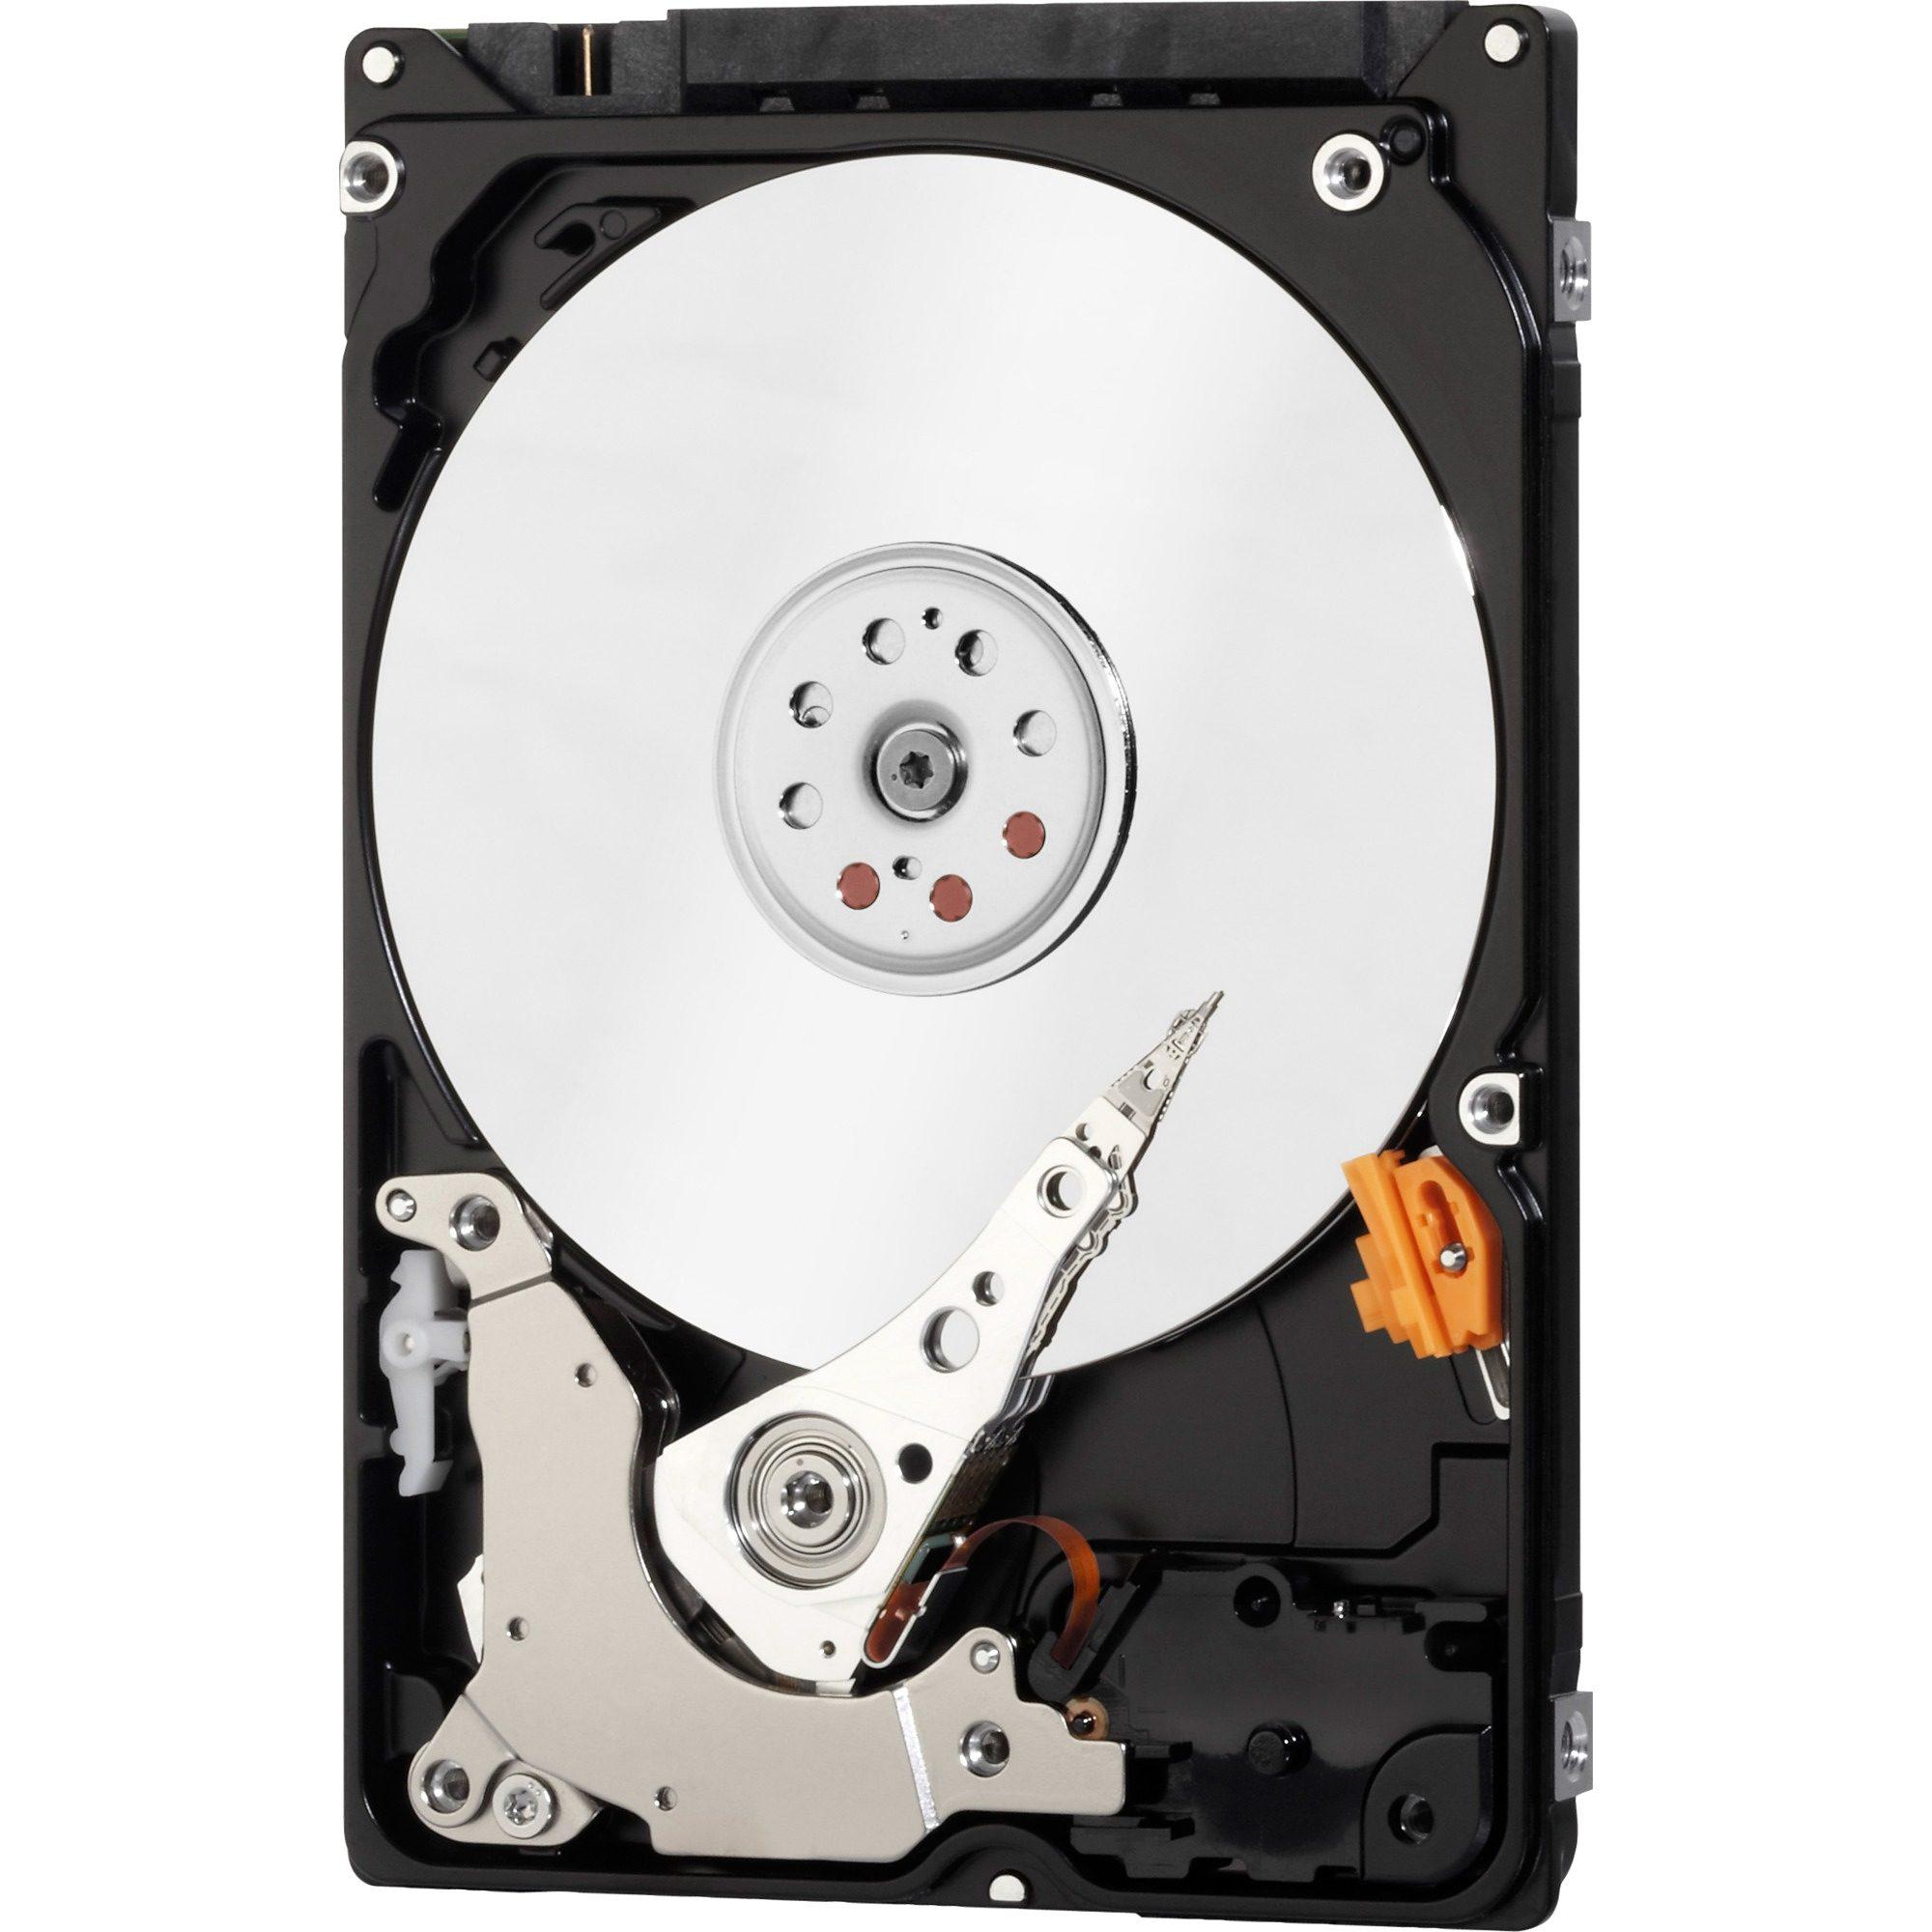 Western Digital Festplatte »WD5000LUCT 500 GB«